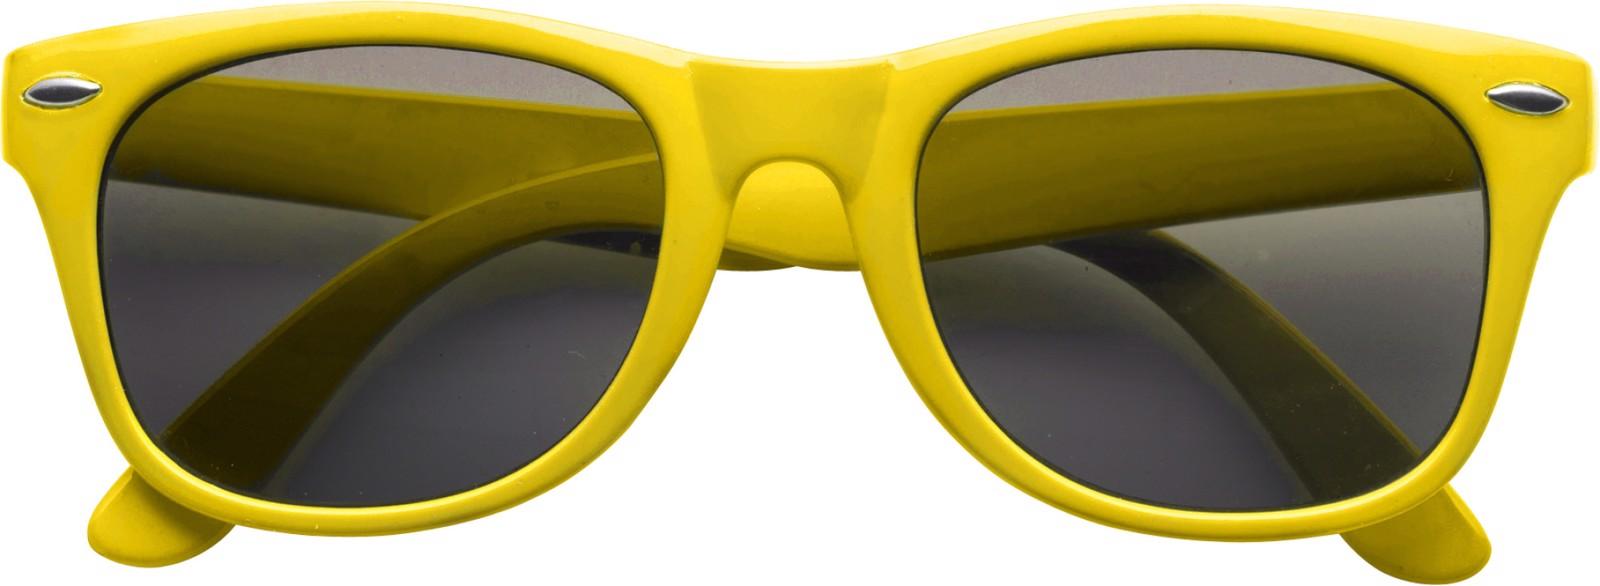 PC and PVC sunglasses - Yellow